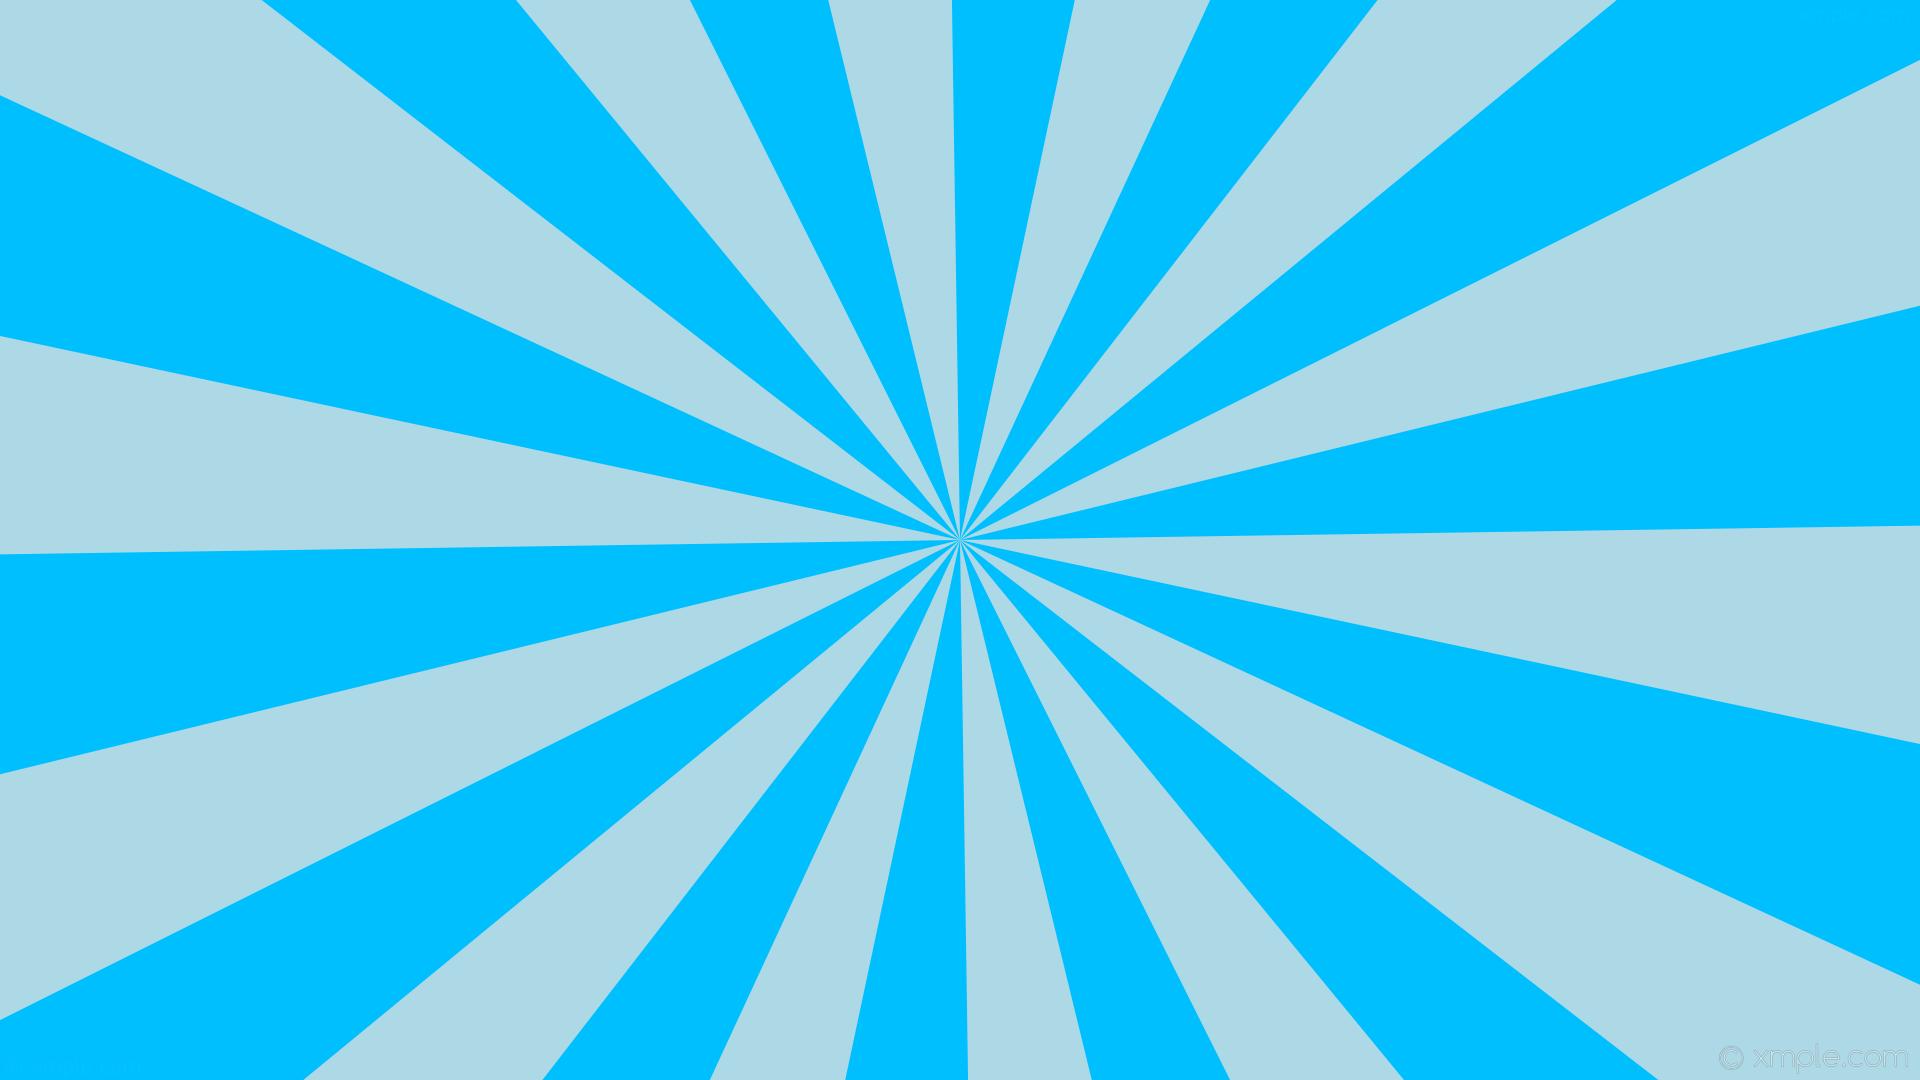 burst-sunburst-blue-rays-1920x1080-c2-ad